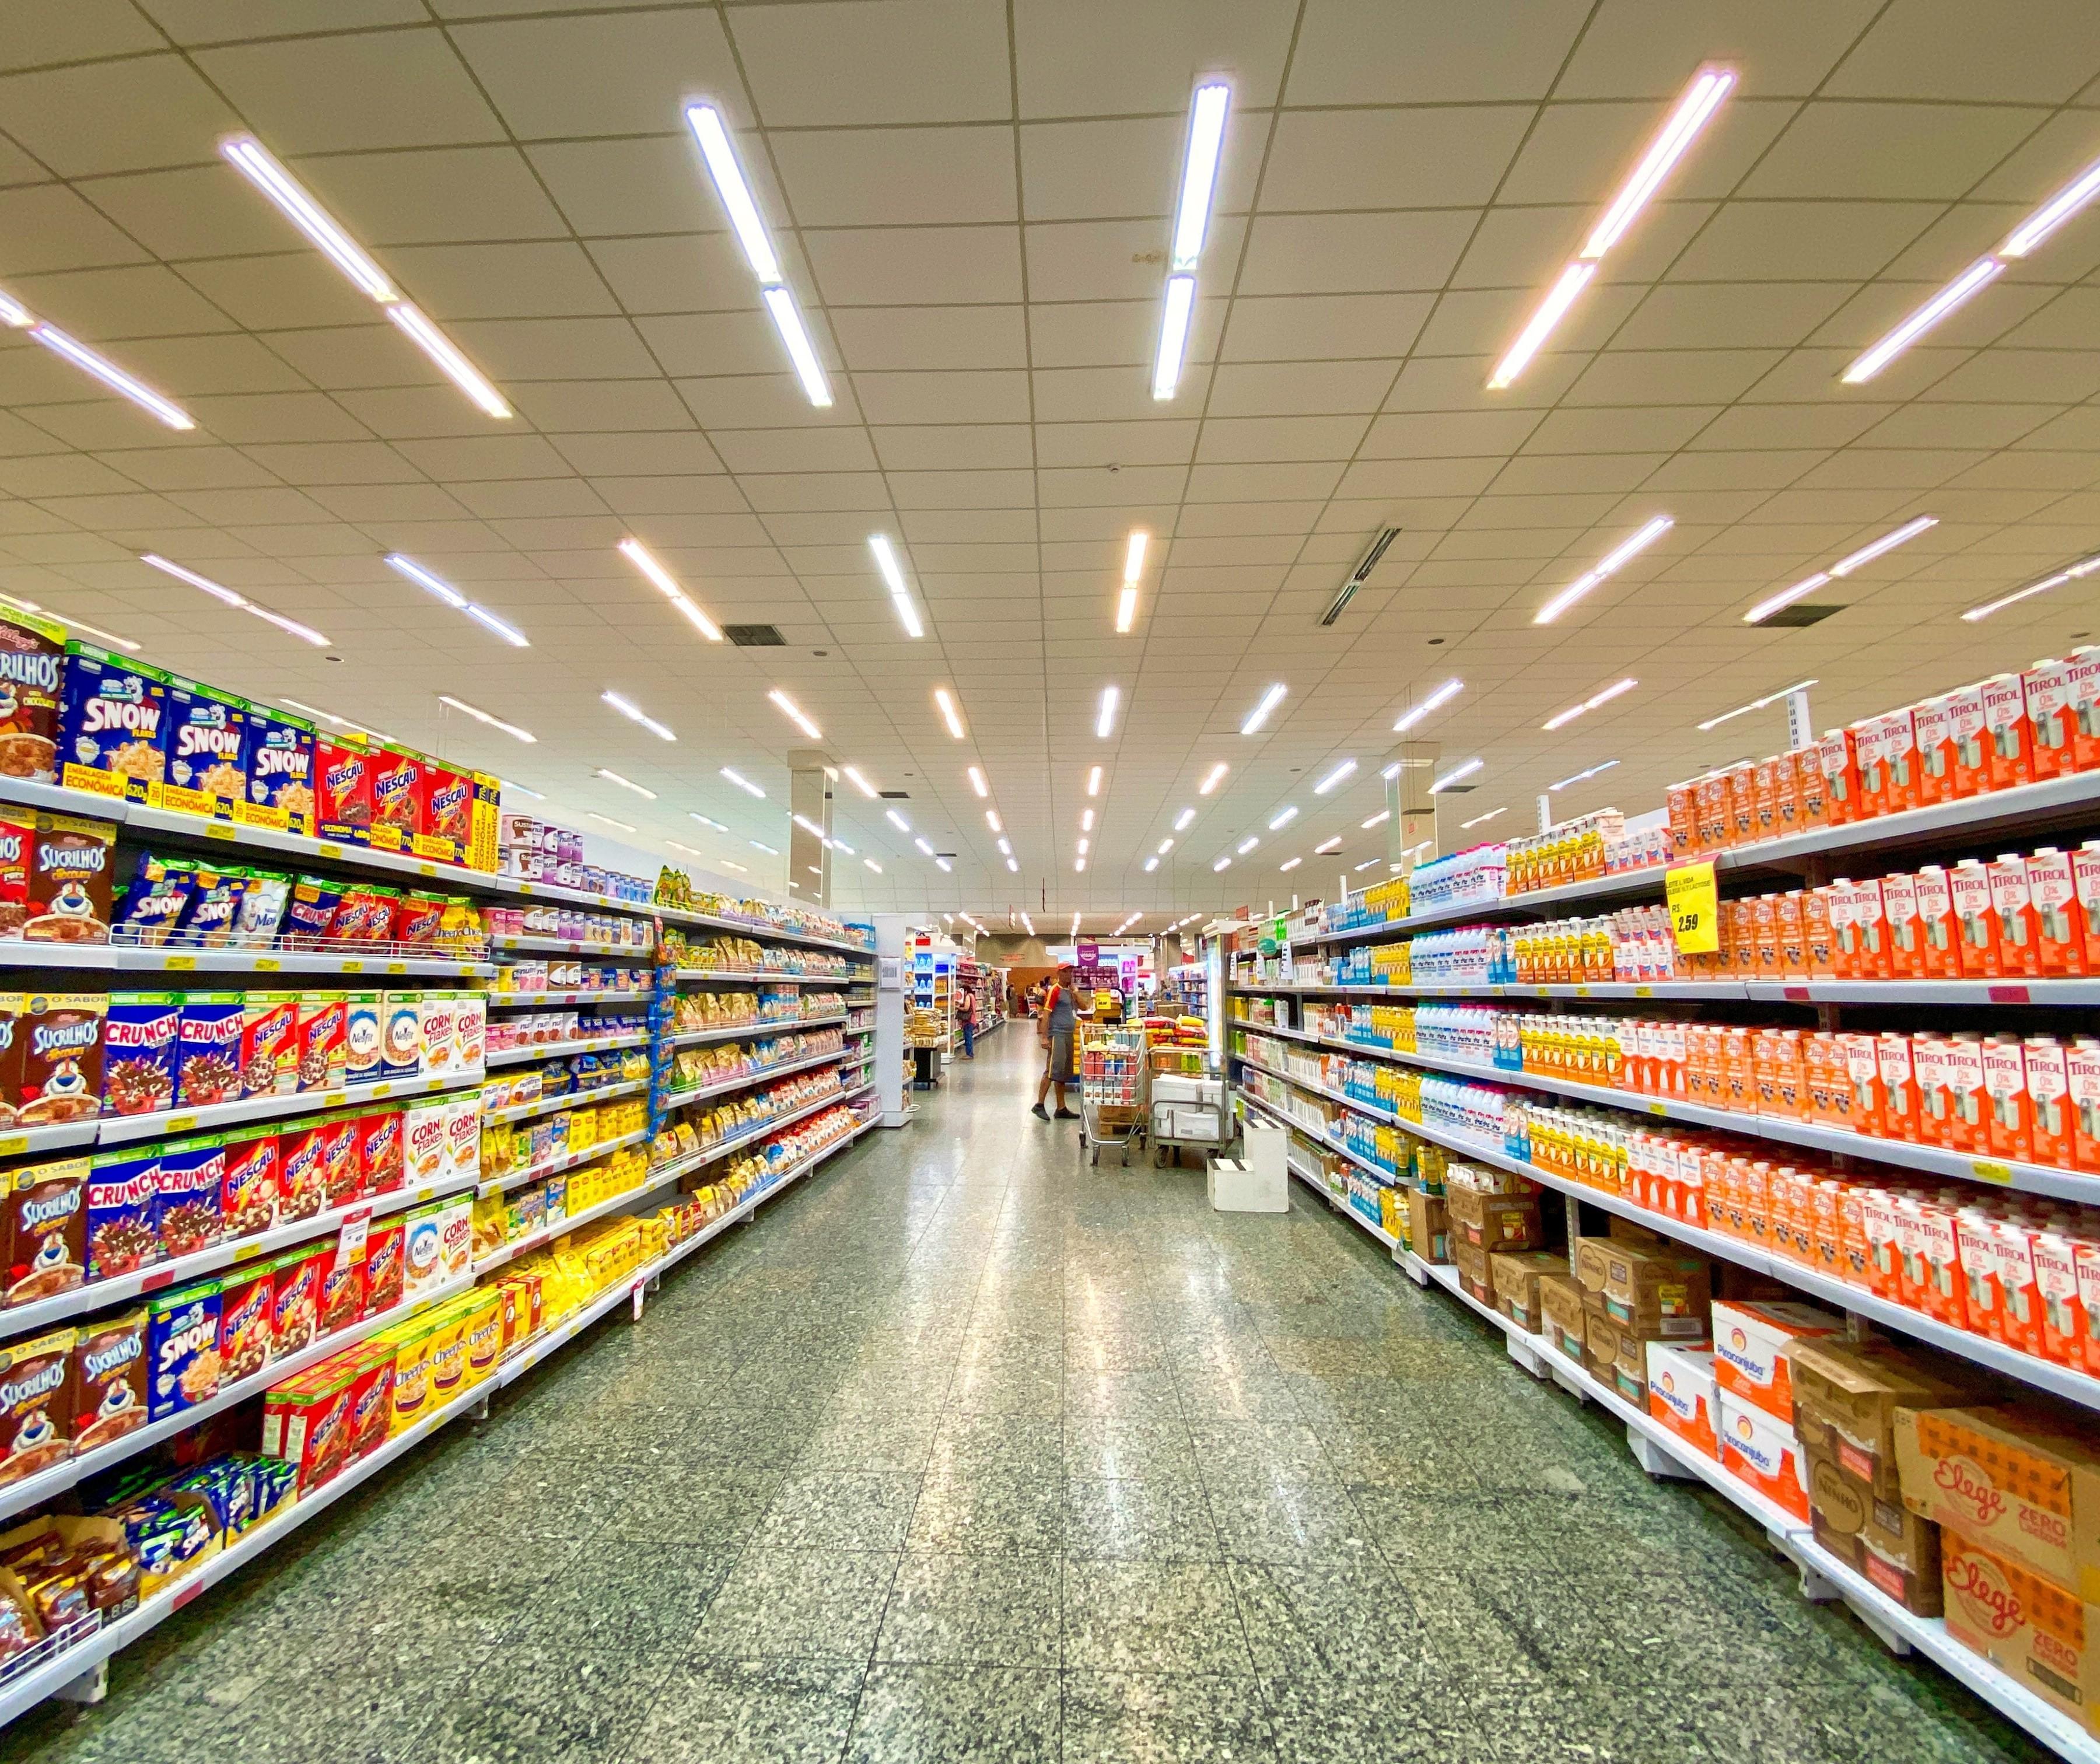 Em isolamento, brasileiro vai menos ao mercado e compra o básico, mostra estudo